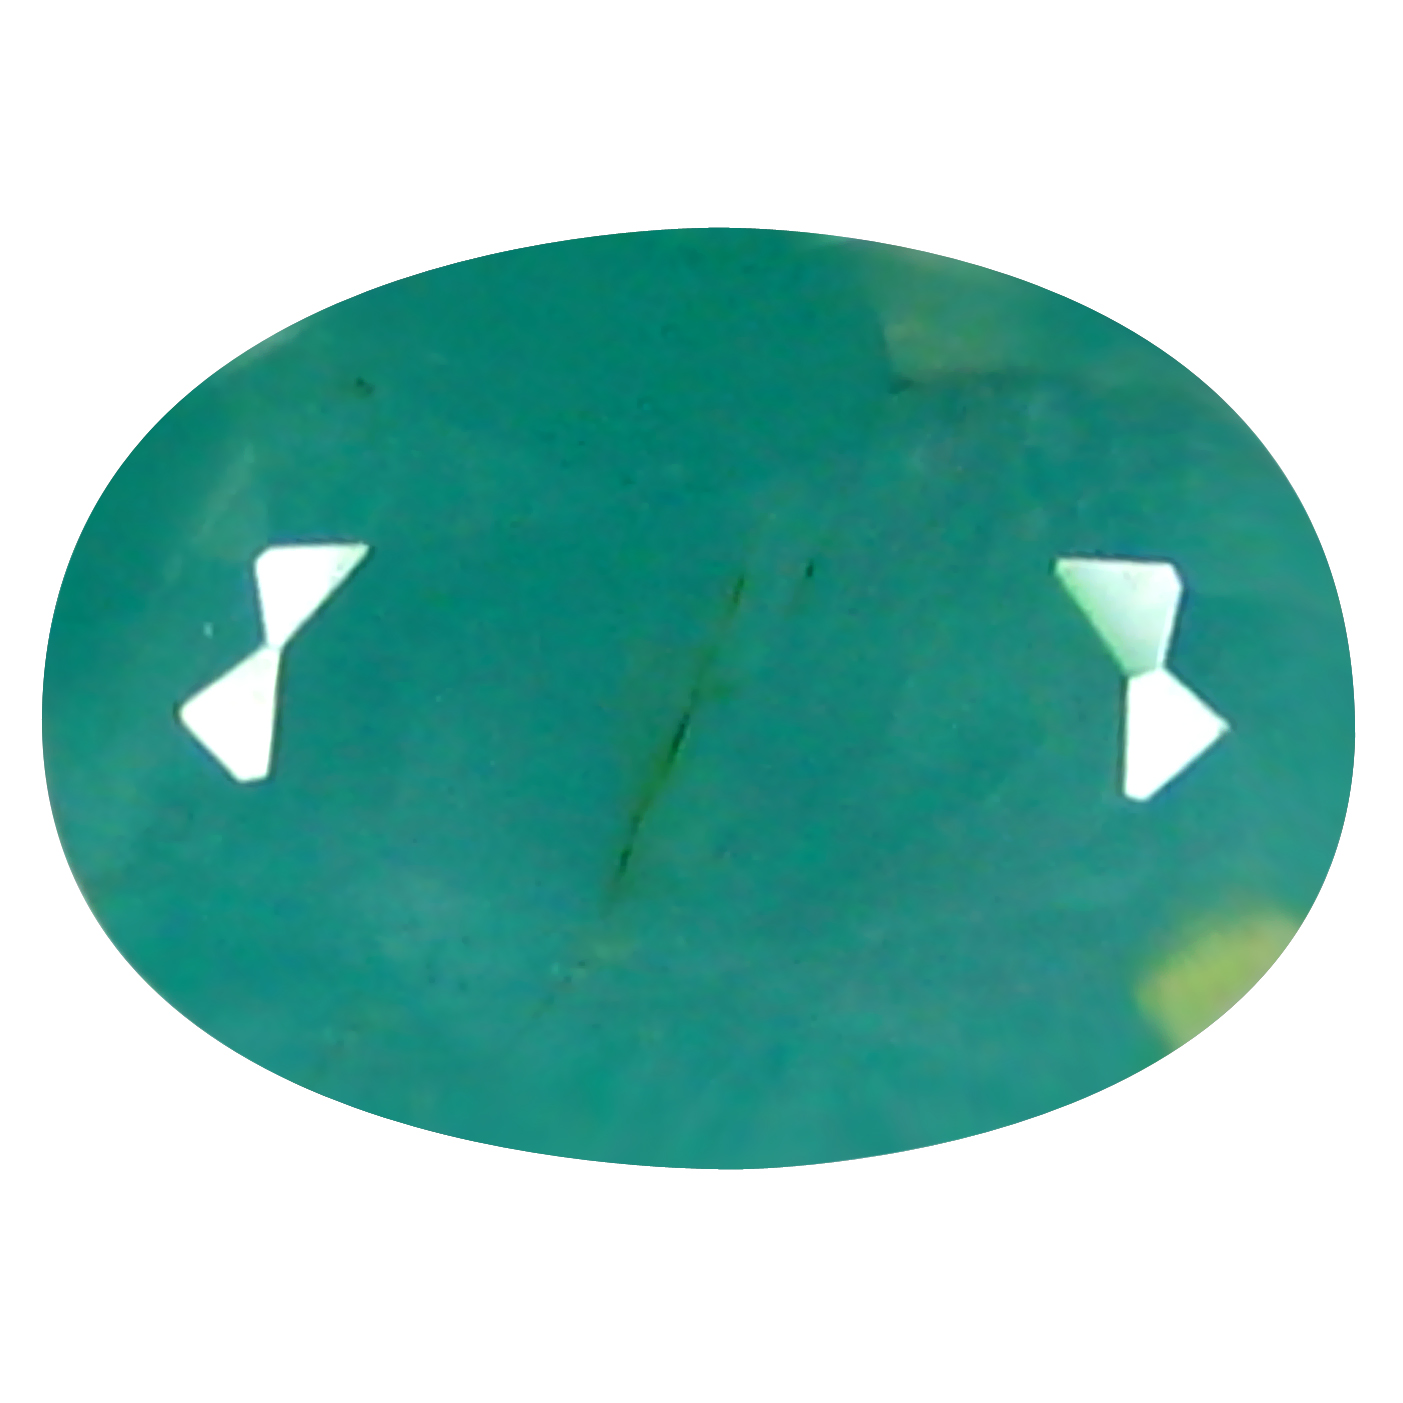 0.74 ct  Valuable Oval Shape (7 x 5 mm) Bluish Green Grandidierite Natural Gemstone